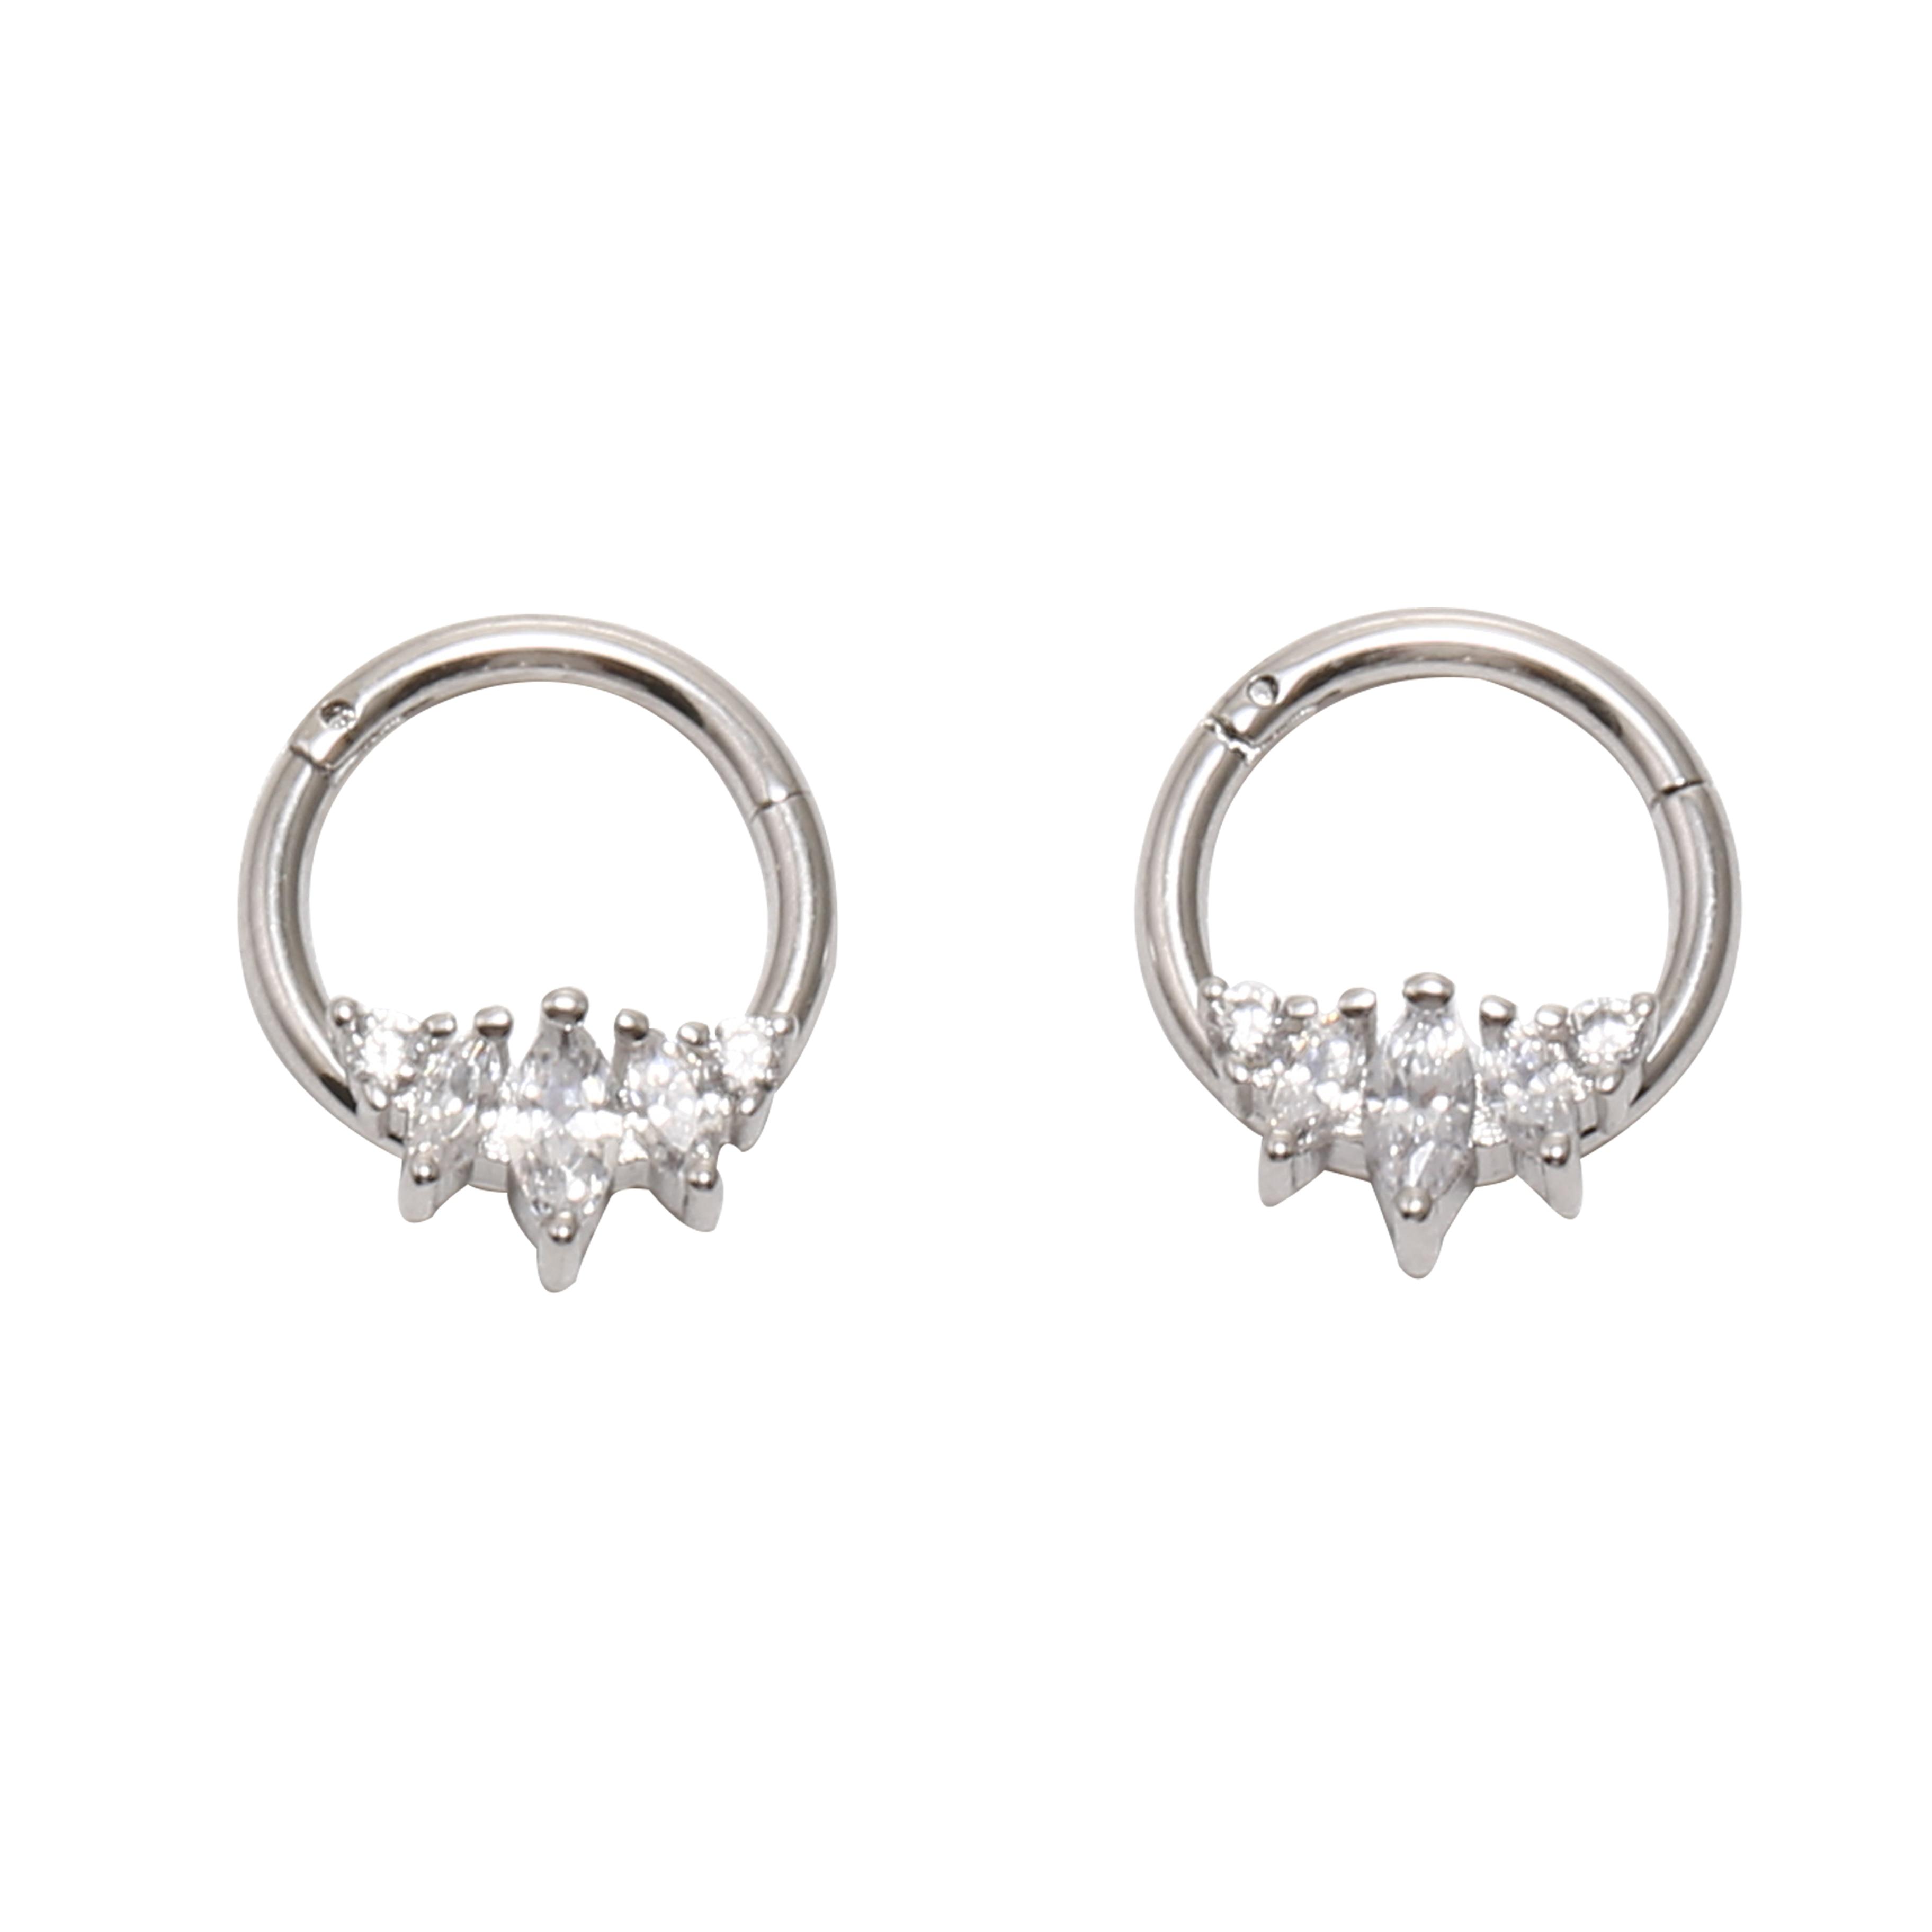 10 unids/lote envío gratis 5 gemas CZ inconsútil con bisagras segmento anillo Clicker cartílago nariz/labio/aro para la oreja Septum 16G CZ Shine nuevo